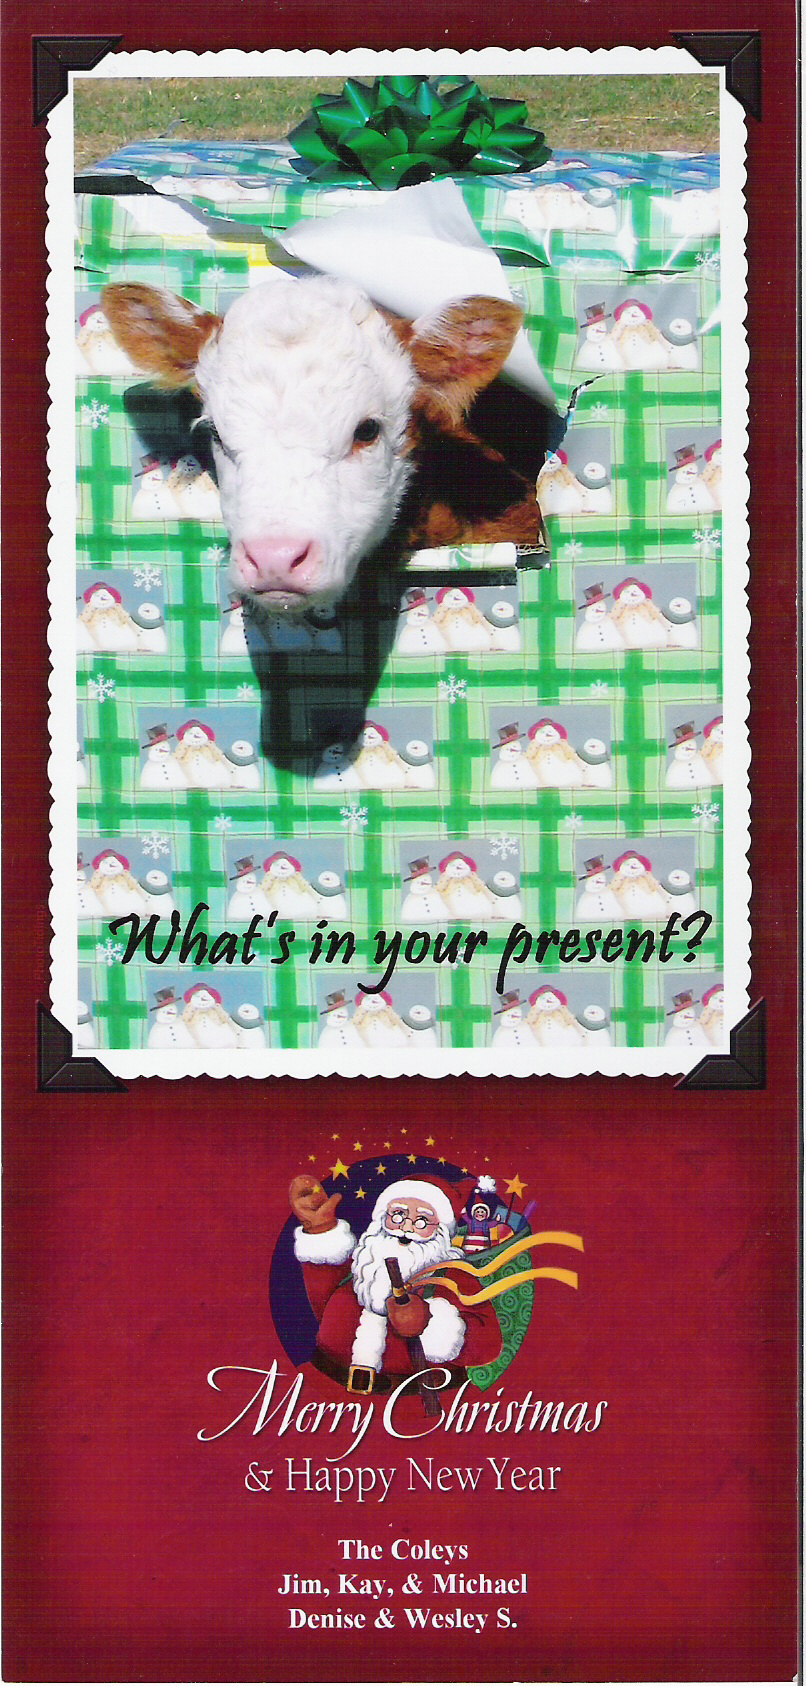 Coley Christmas card 2005